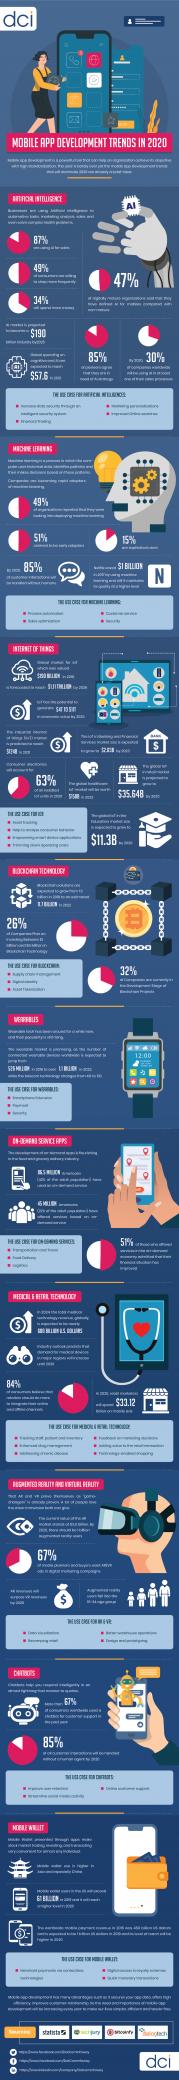 Mobile App Development Trends 2020 [Infographic]